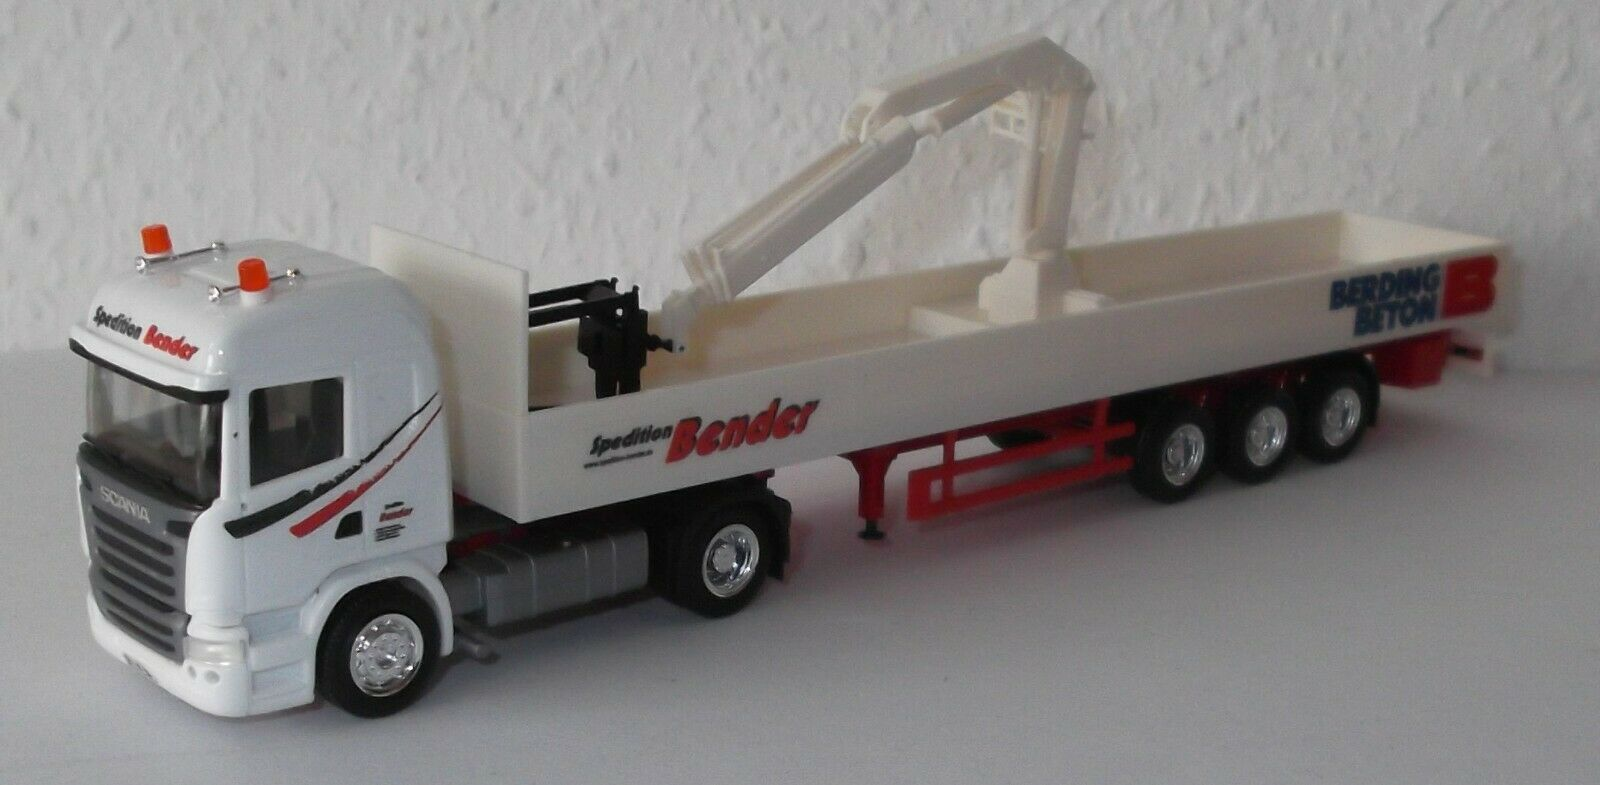 Herpa scania r`09 hl transportista Bender baustoffsattelzug con grúa berding hormigón